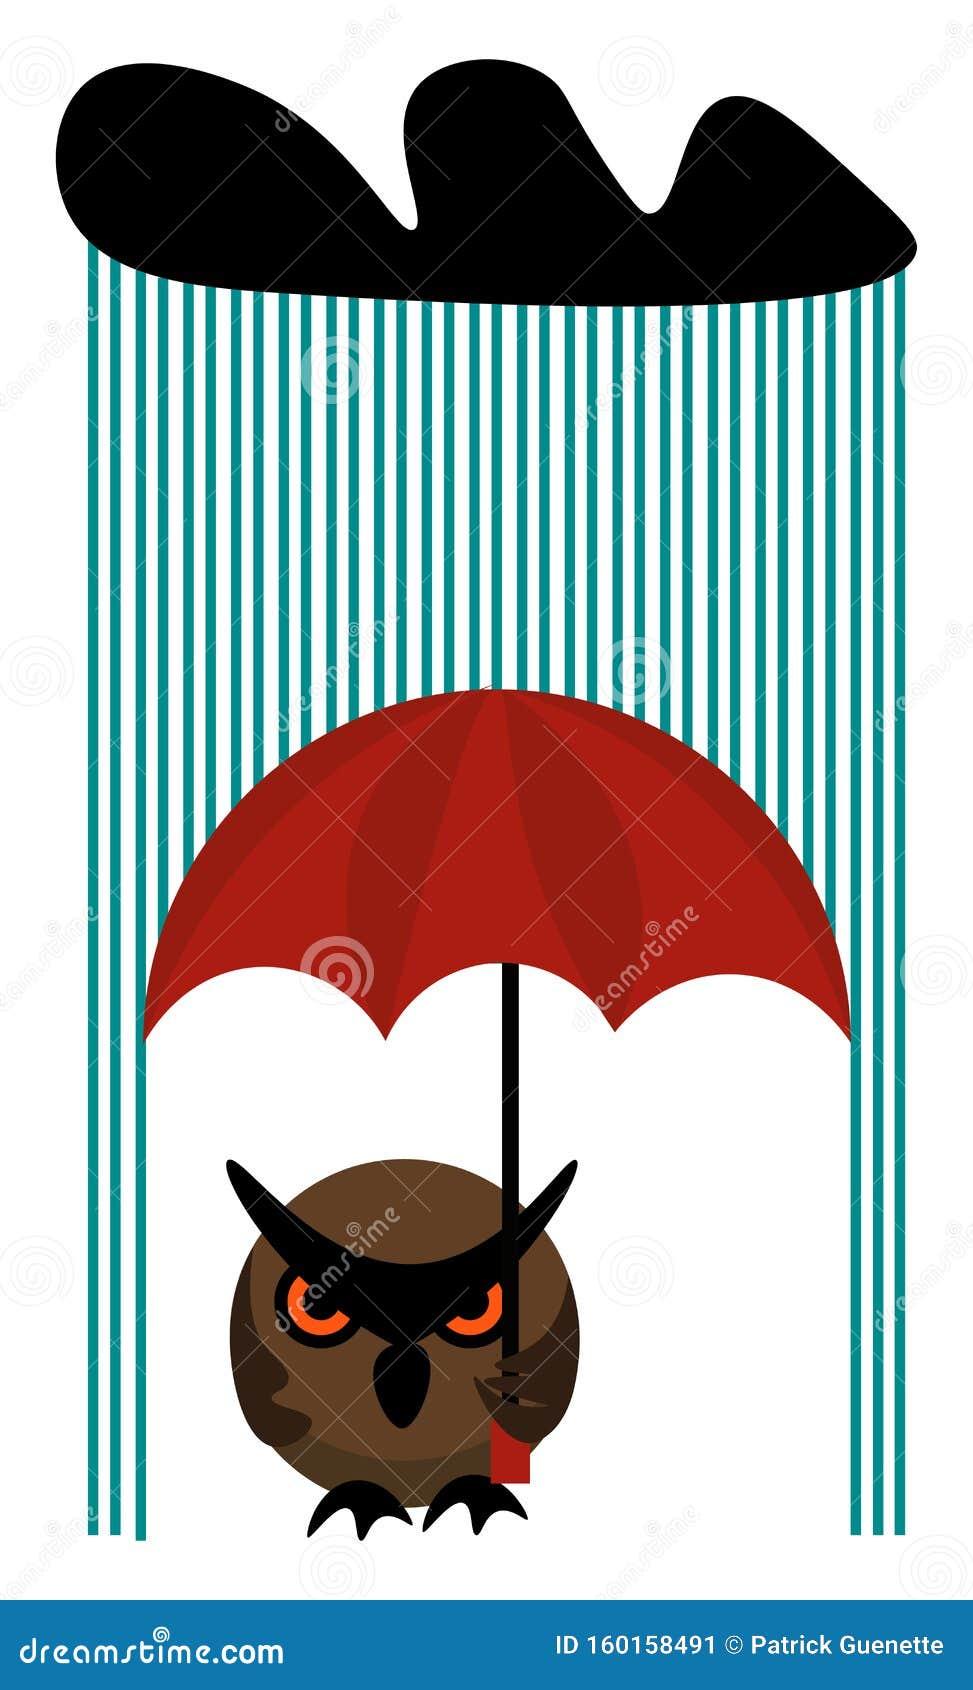 Clipart Of An Owl Holding An Umbrella On A Rainy Day ...